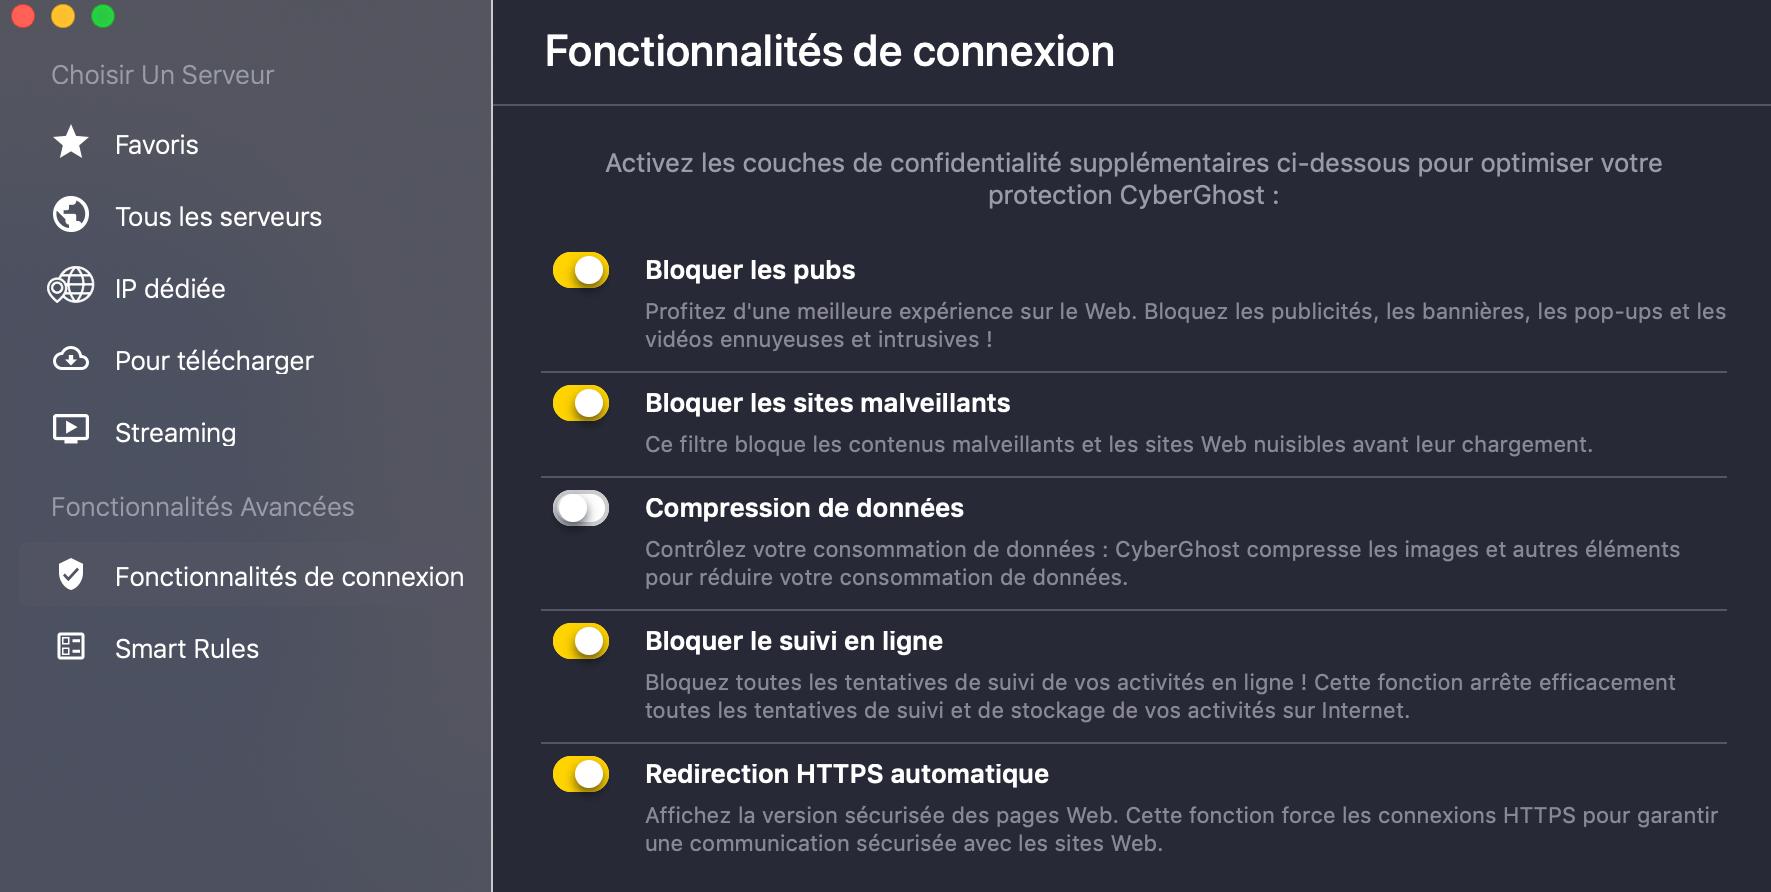 Fonctionnalites CyberGhost-VPN